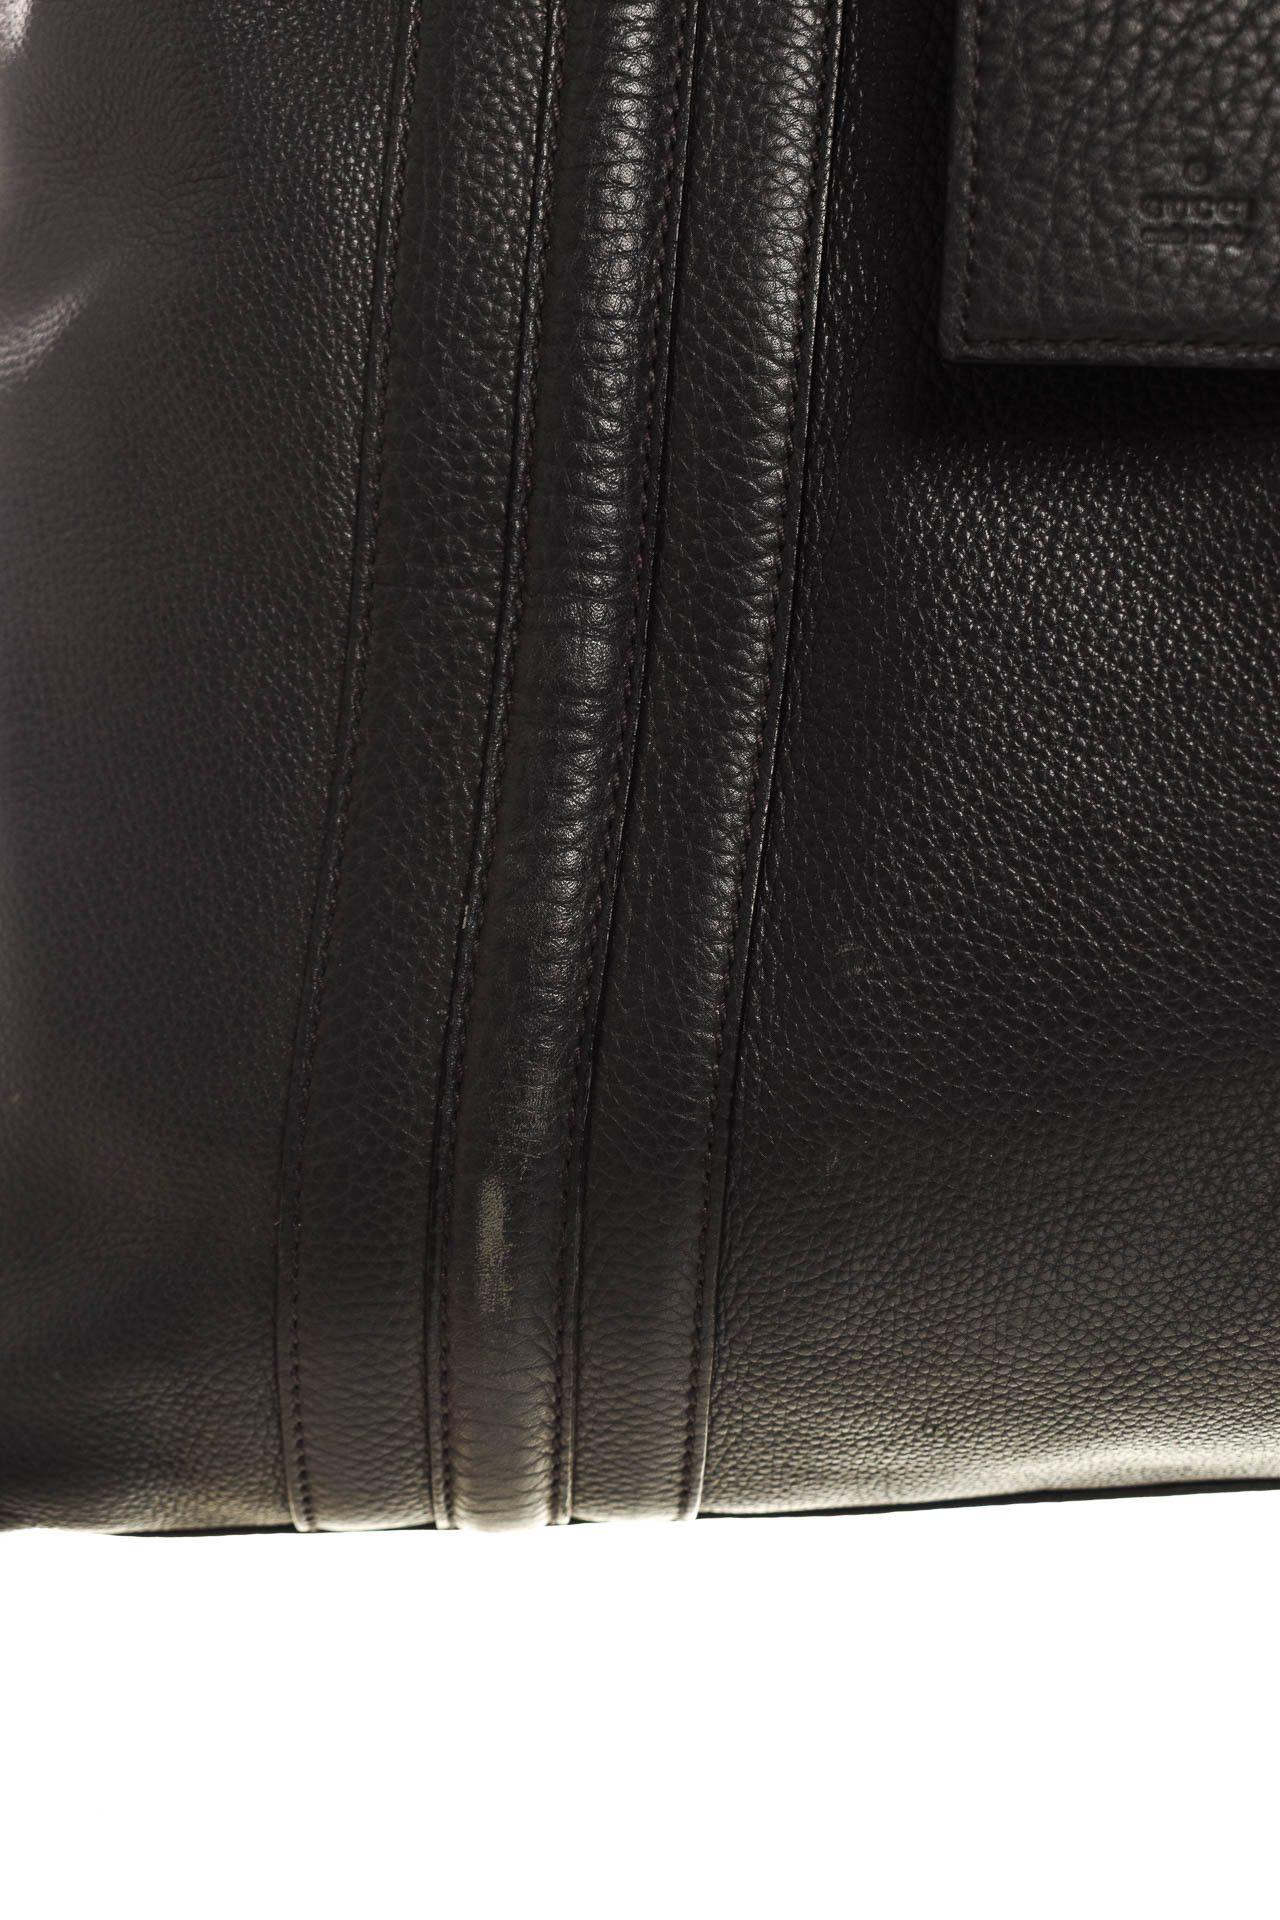 Gucci - Hand Bag Grafite - Foto 8